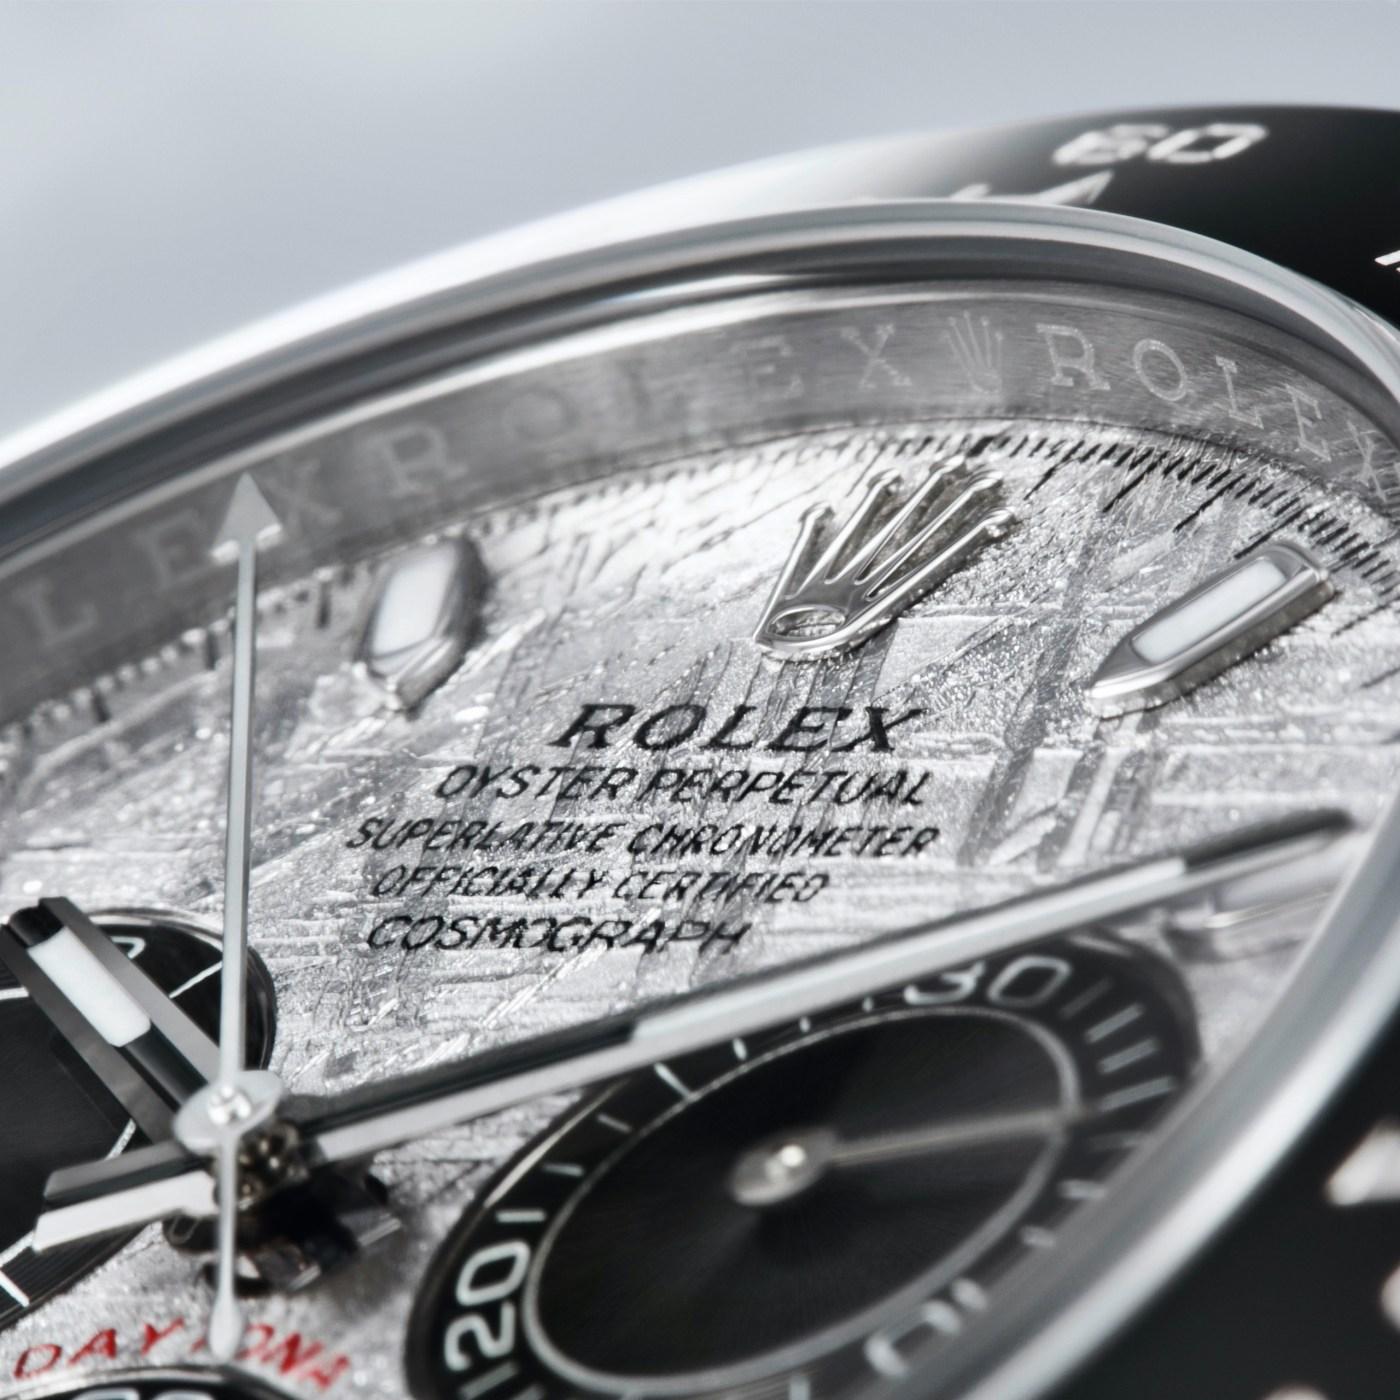 2021 Rolex Daytona 18K Gold with Meteorite Dial